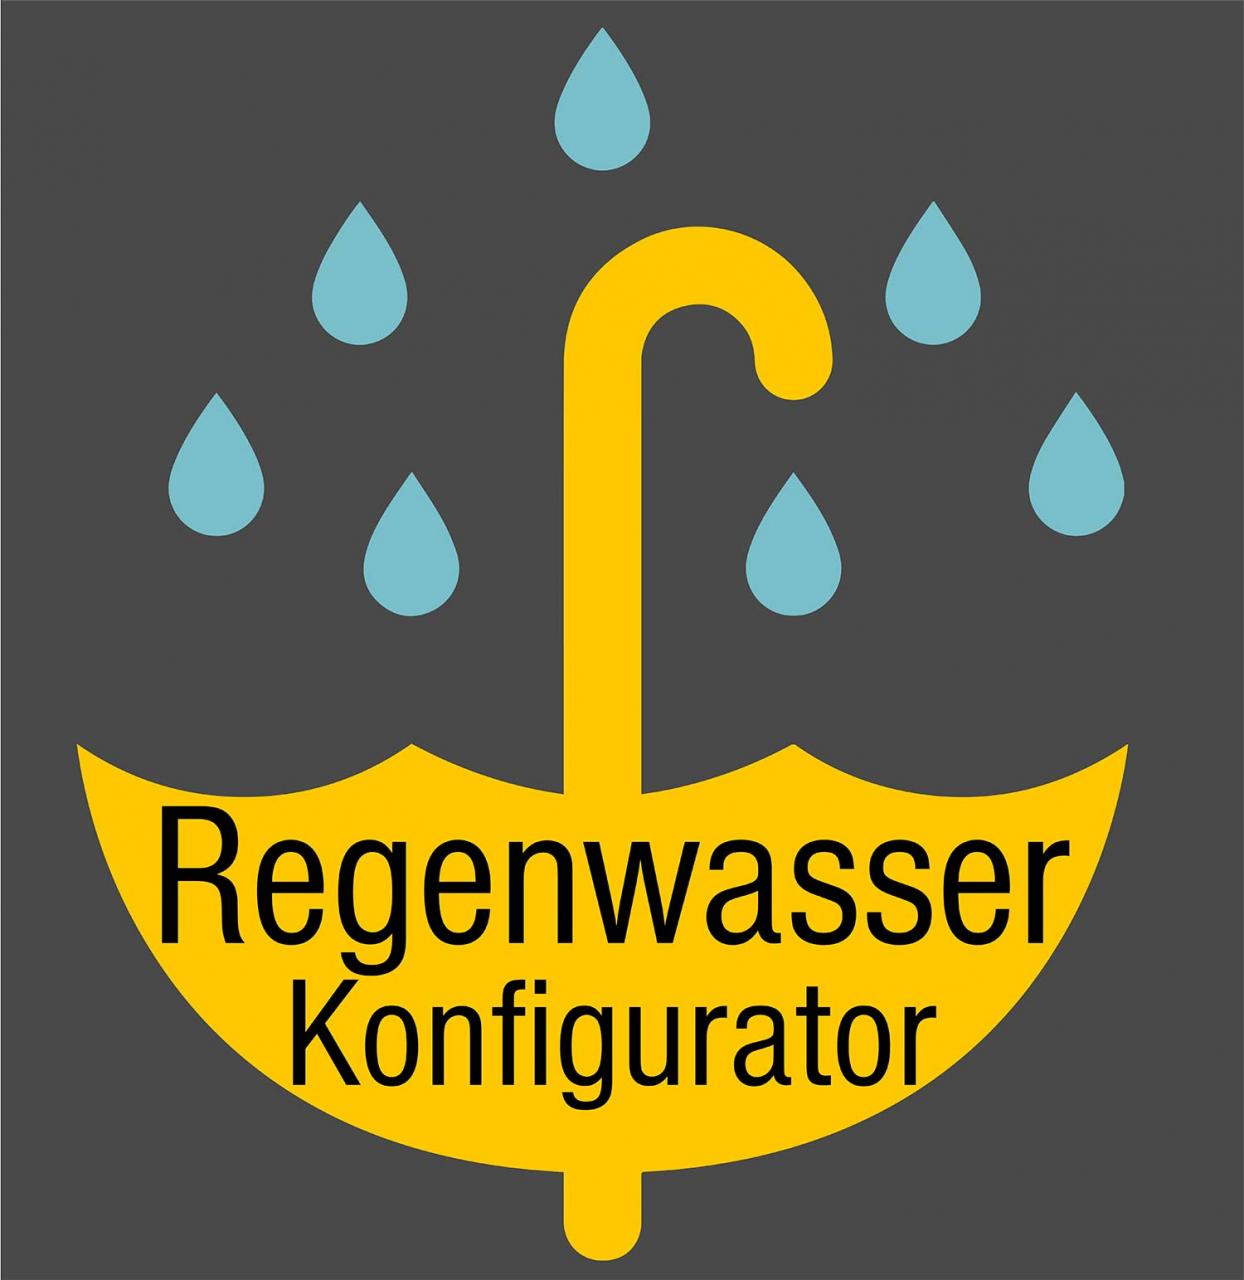 Regenwasser Konfigurator